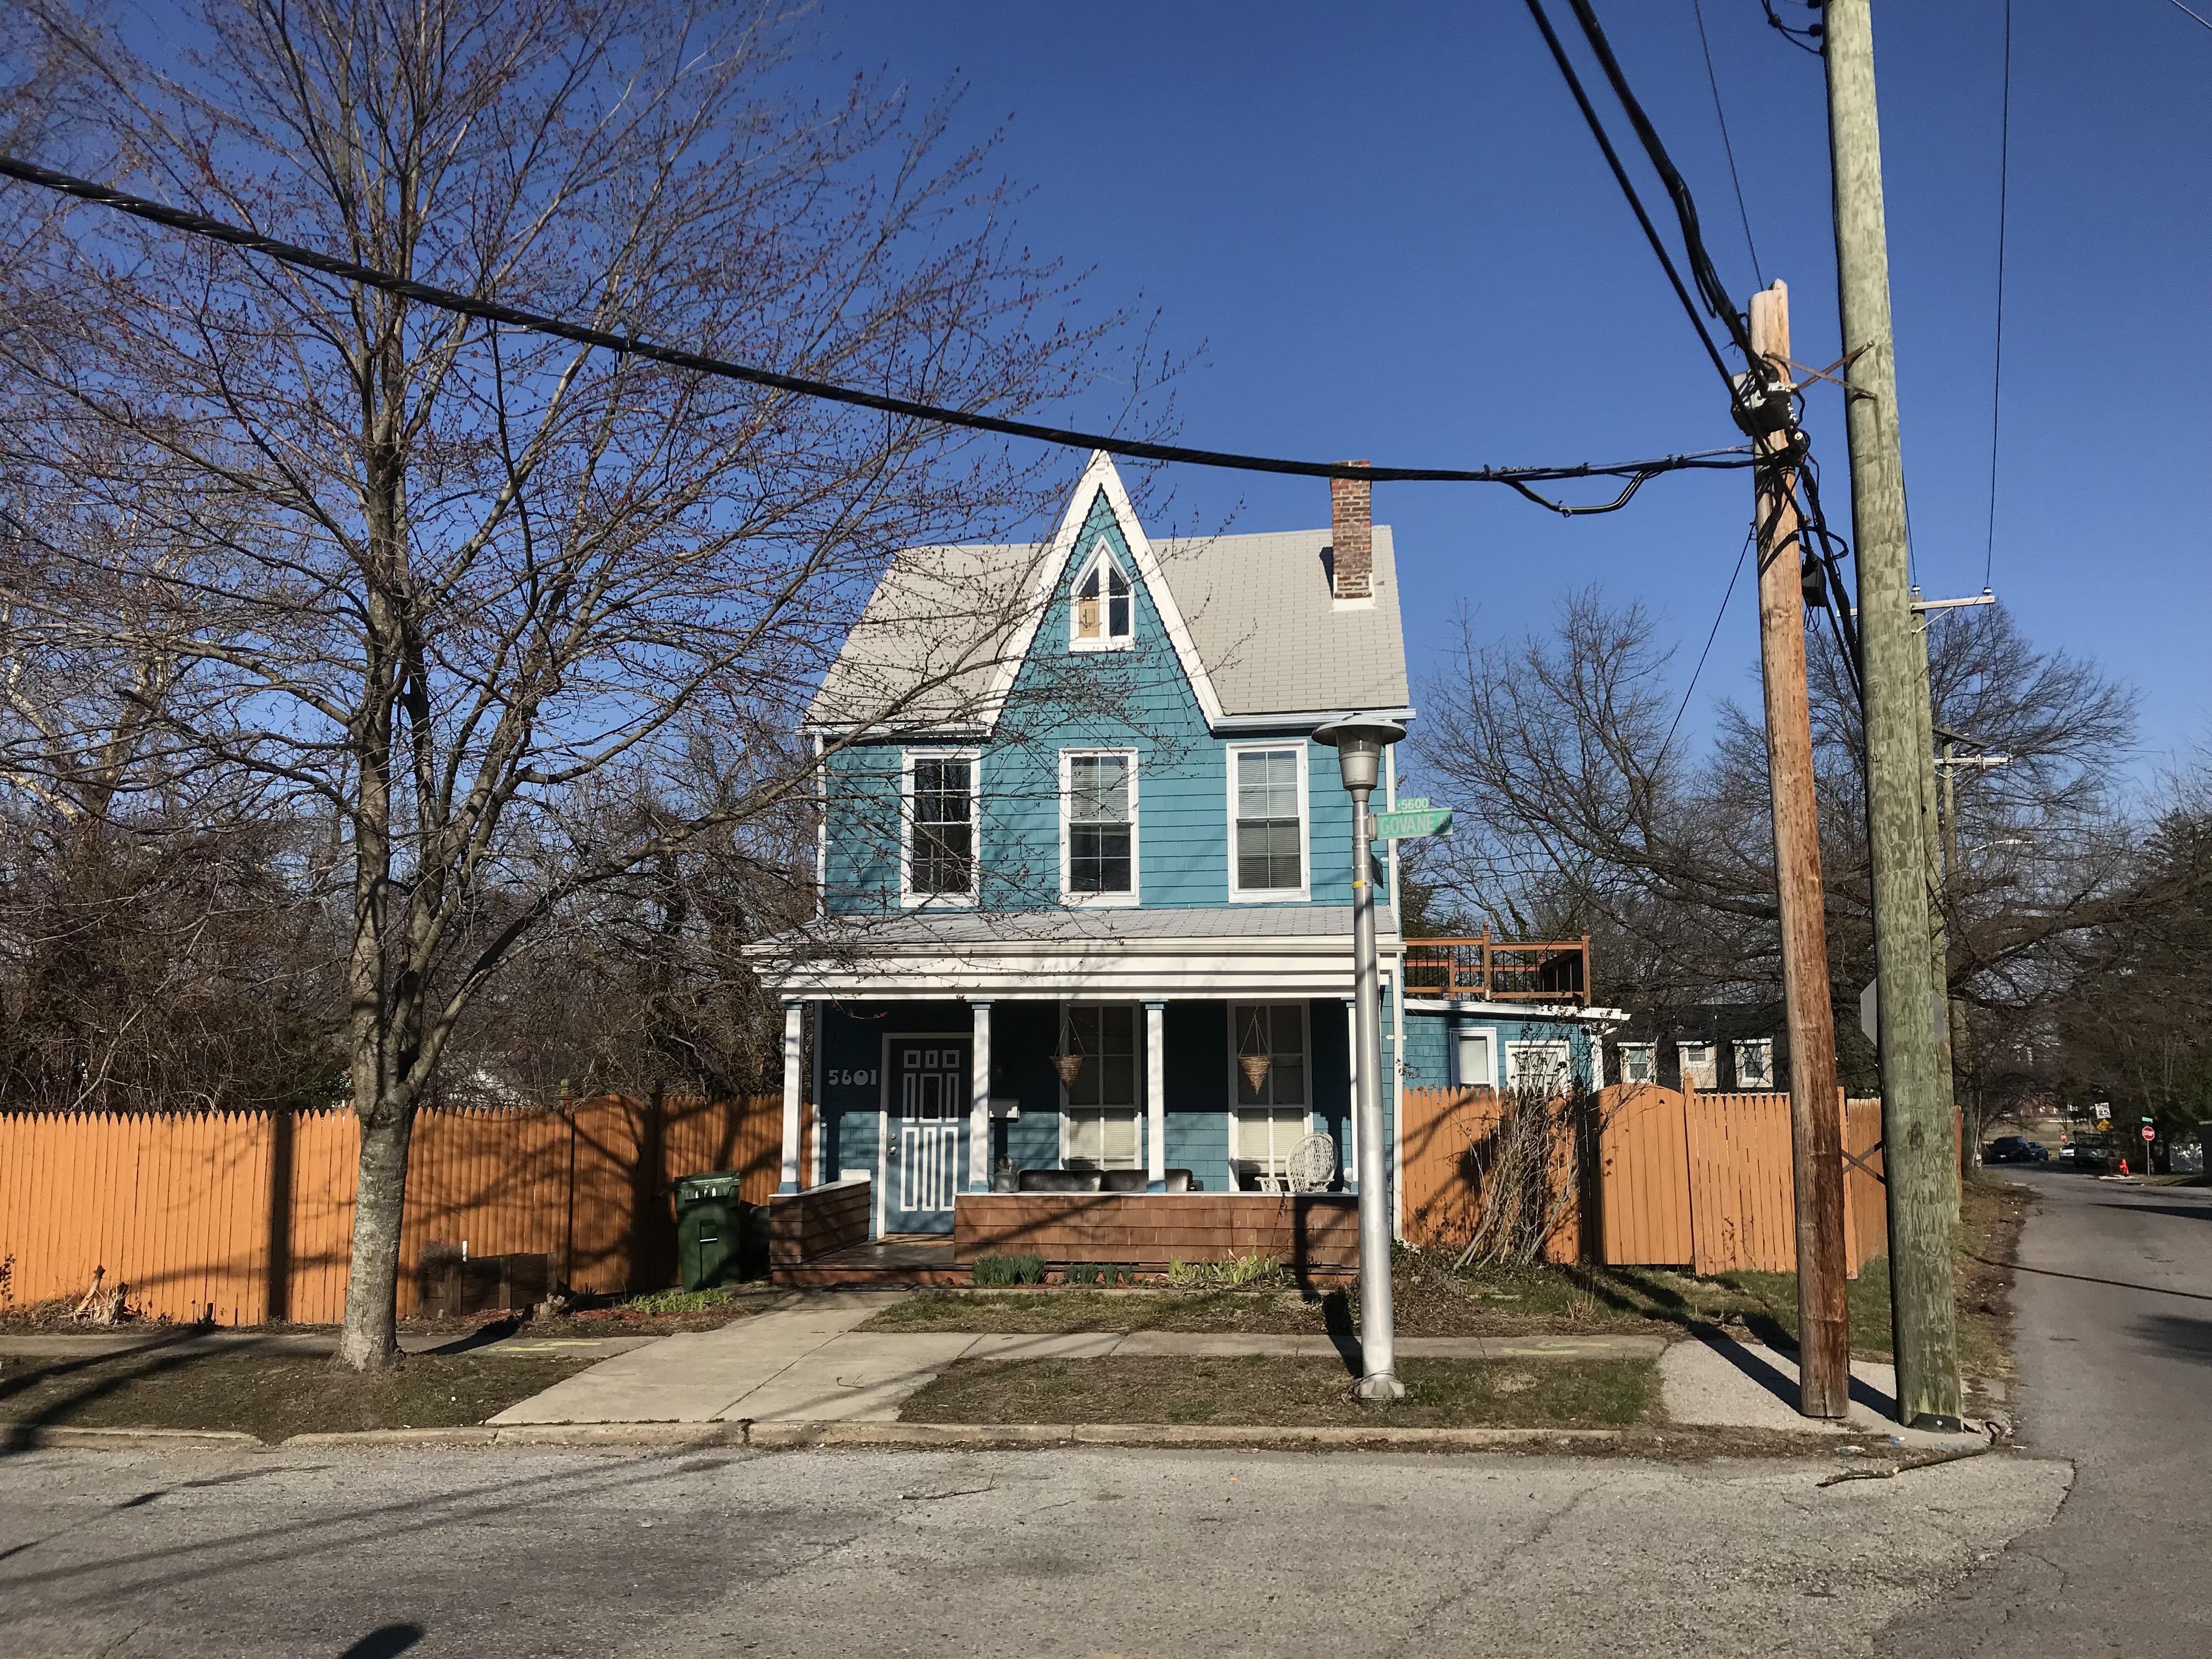 House, 5601 Govane Avenue, Baltimore, MD 21212, Baltimore, Building, Grass, Maryland, HQ Photo